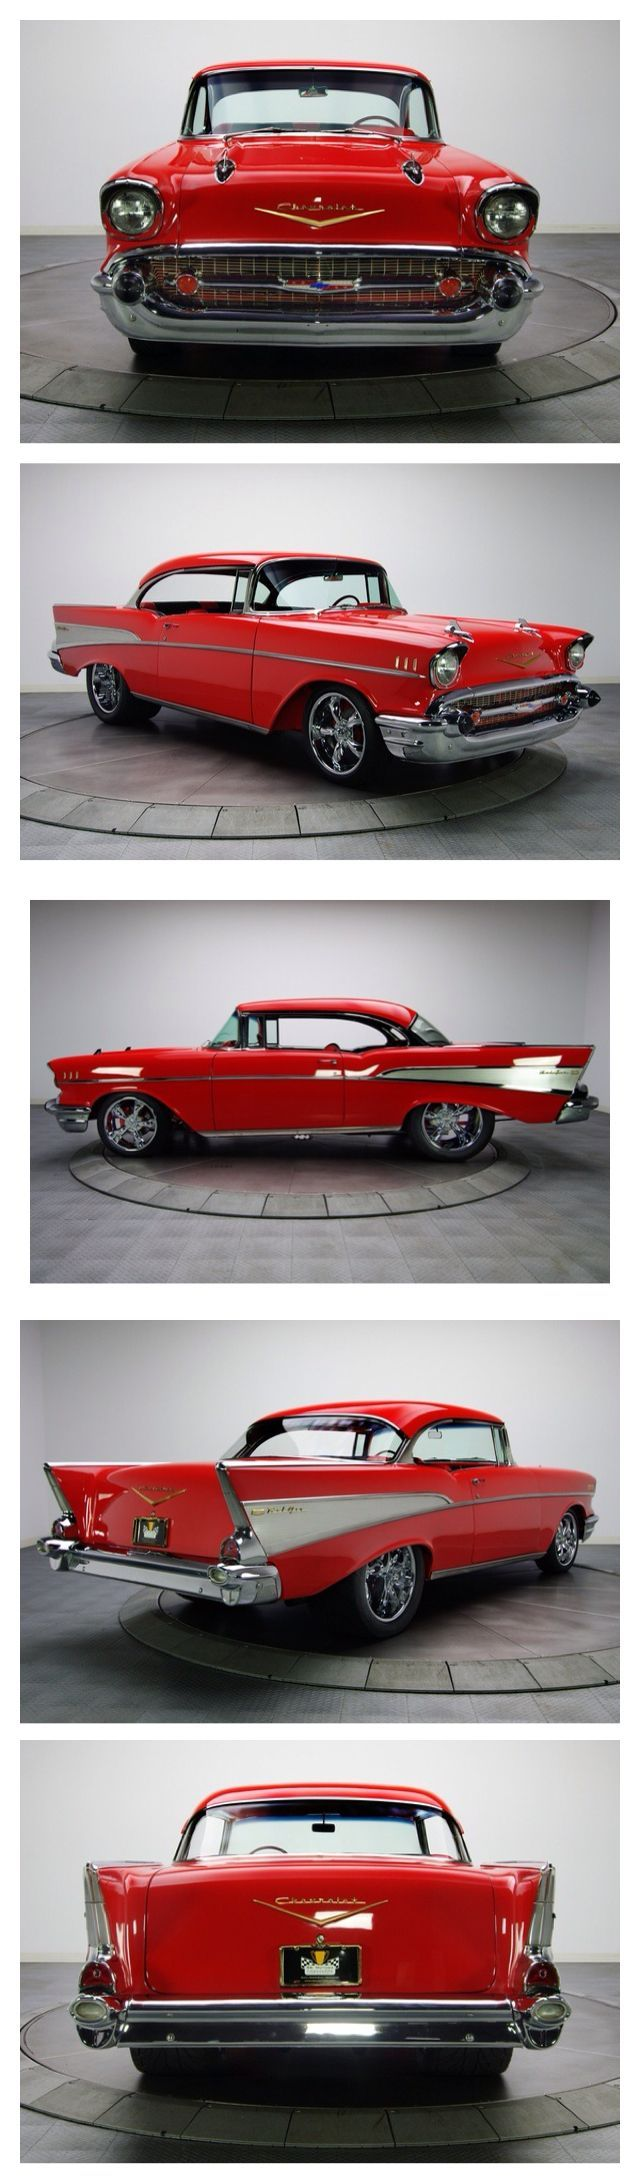 1956 chevrolet belair mjc classic cars pristine - Chevrolet Bel Air 1957